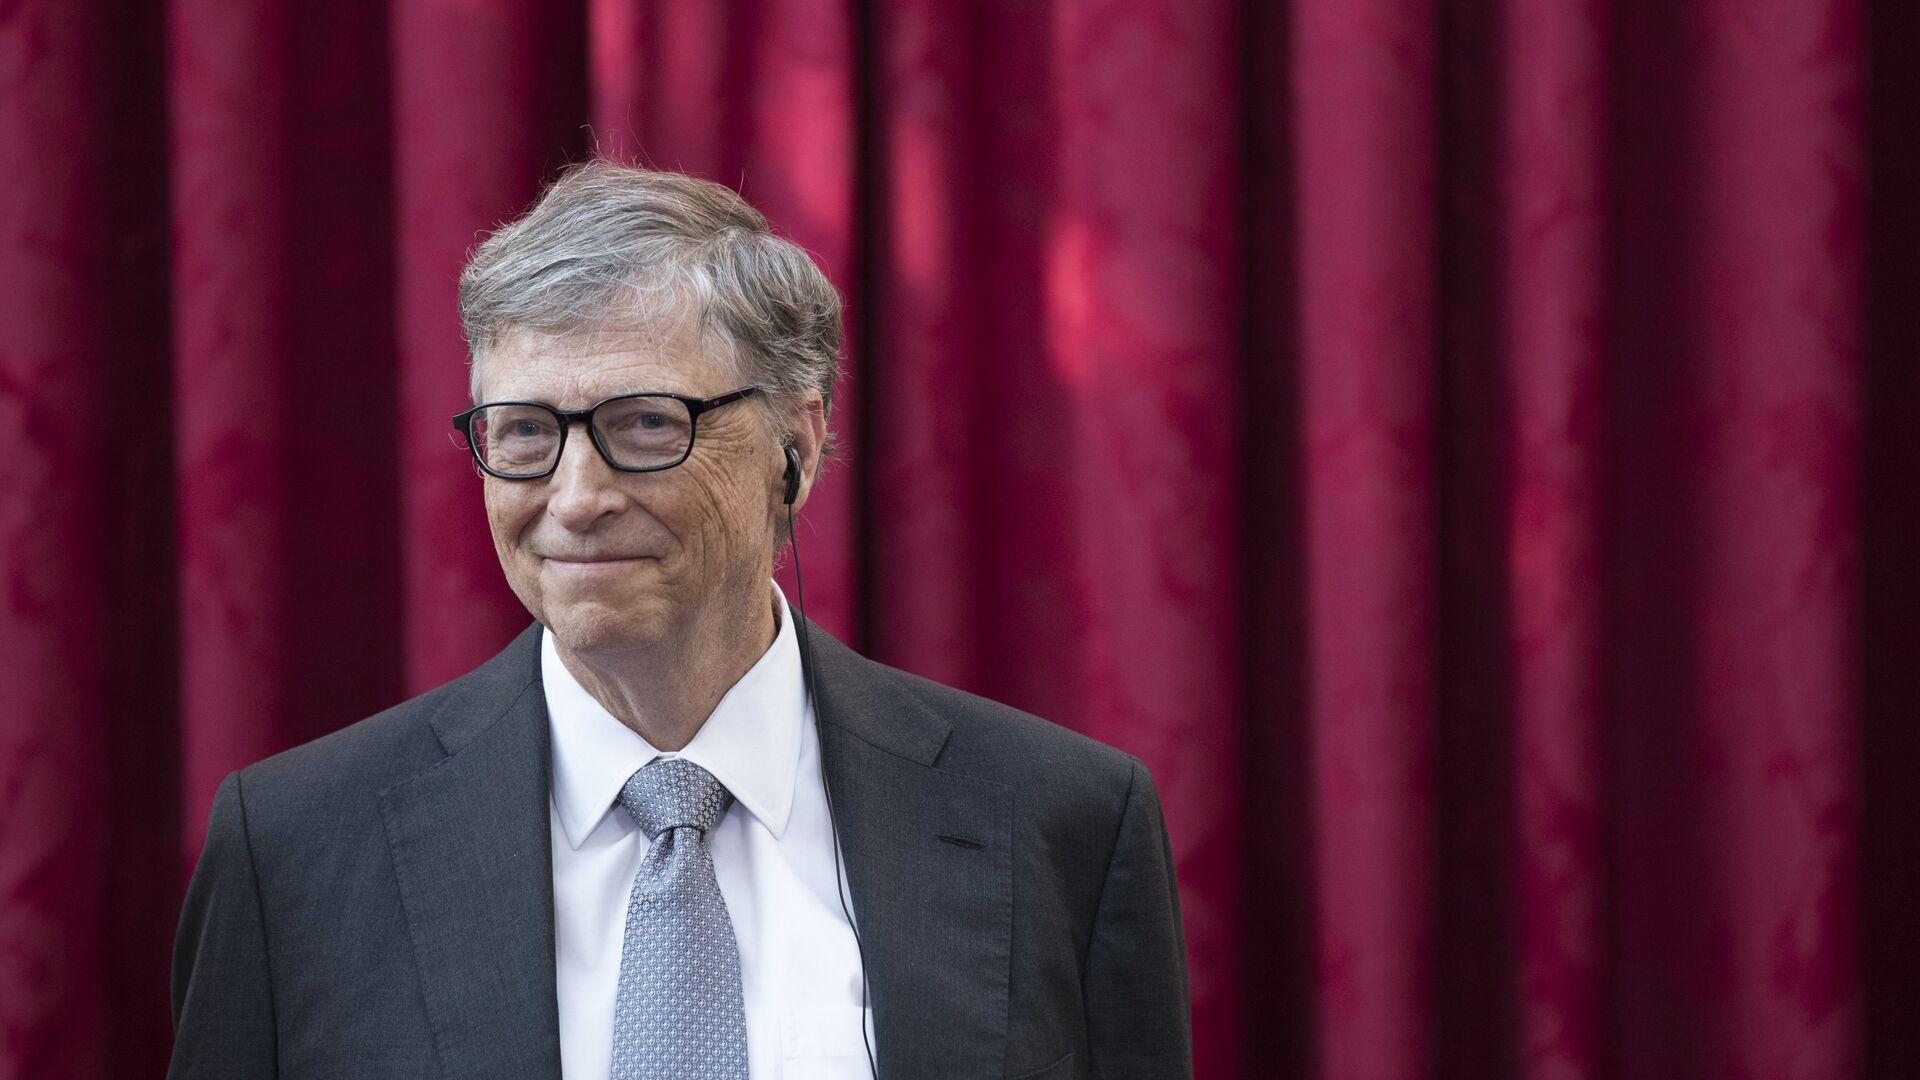 Bill Gates, cofundador de Microsoft - Sputnik Mundo, 1920, 15.02.2021